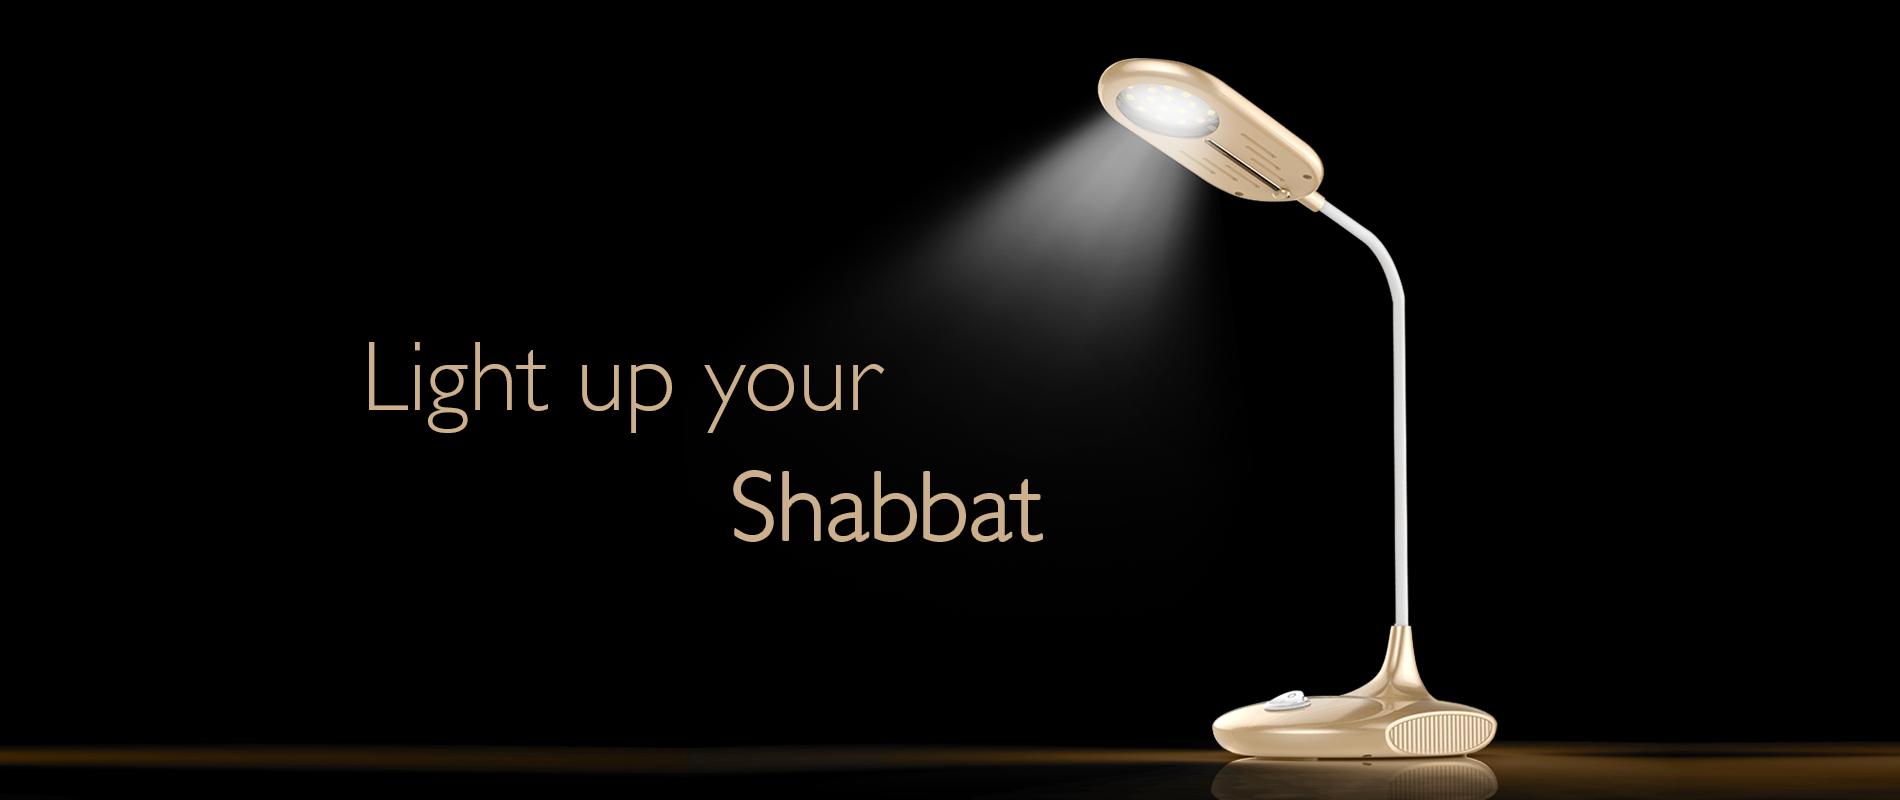 Lampe de chabbat Or LéShabbat -